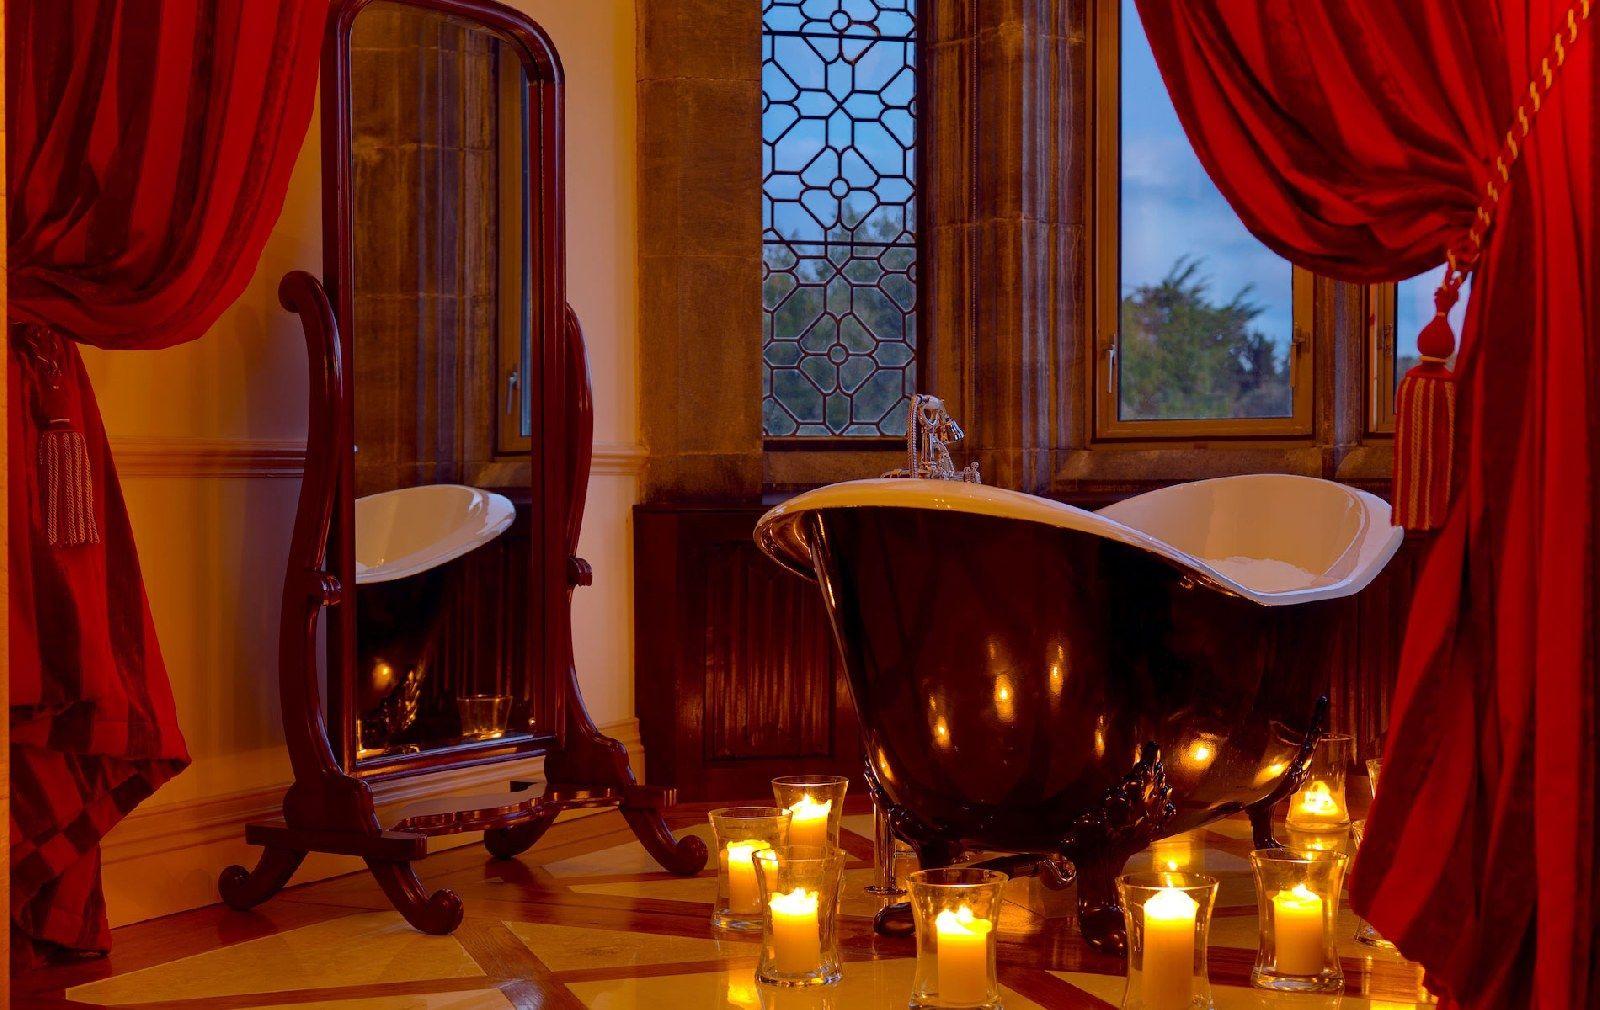 Luxury Bathrooms Ireland adare manor hotel gallery   5 star hotel gallery ireland   luxury